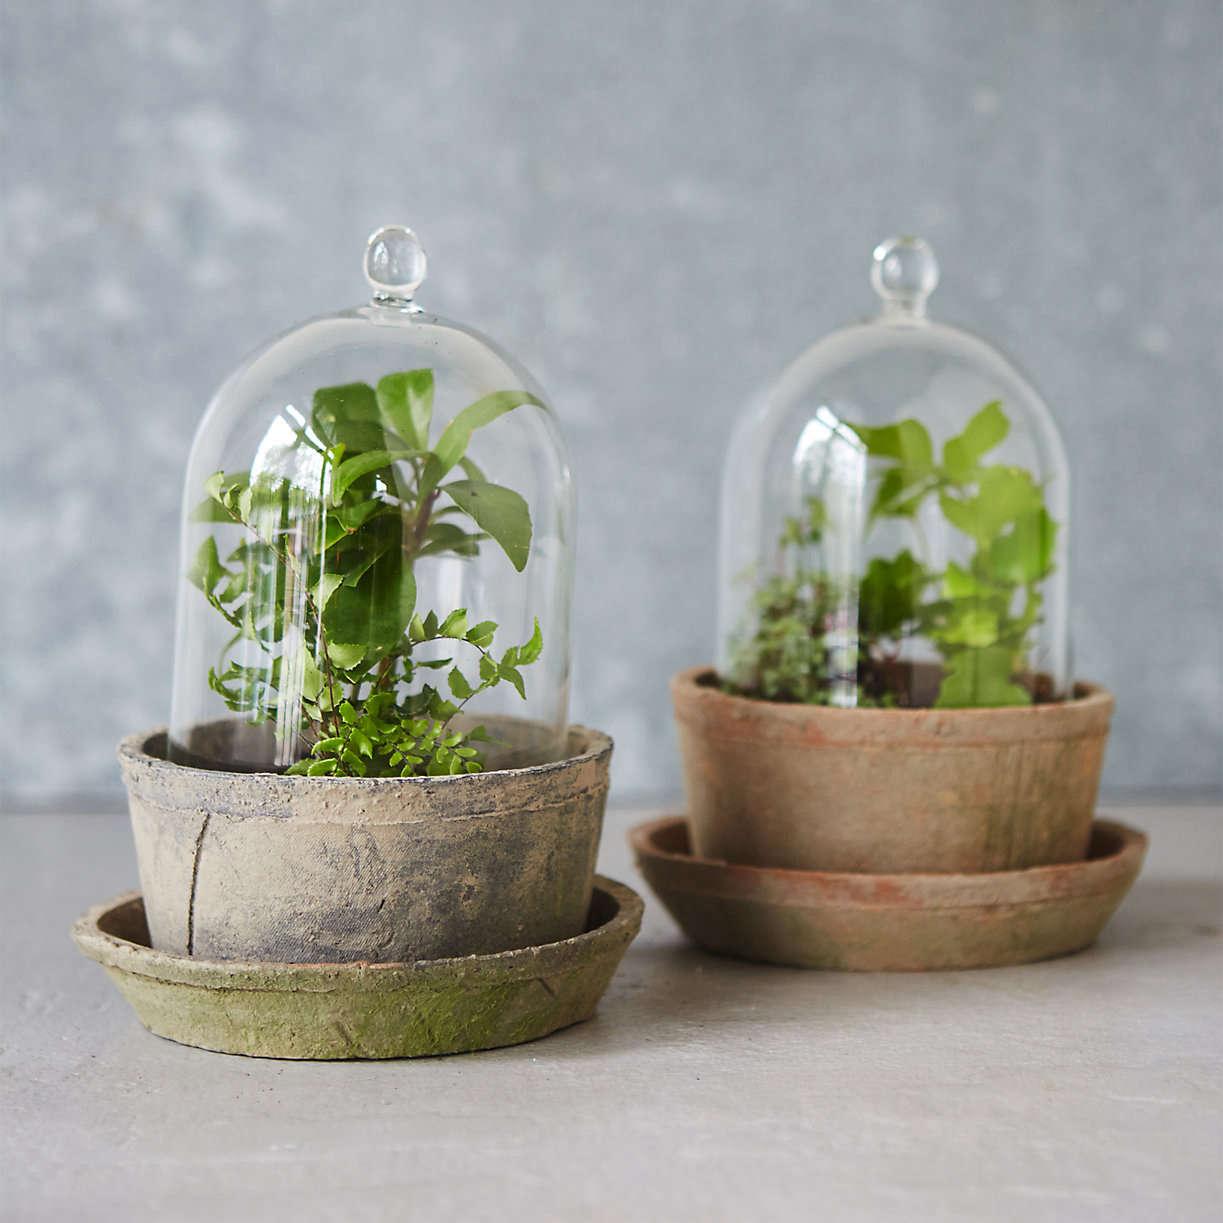 10 easy pieces glass cloche terrariums gardenista. Black Bedroom Furniture Sets. Home Design Ideas